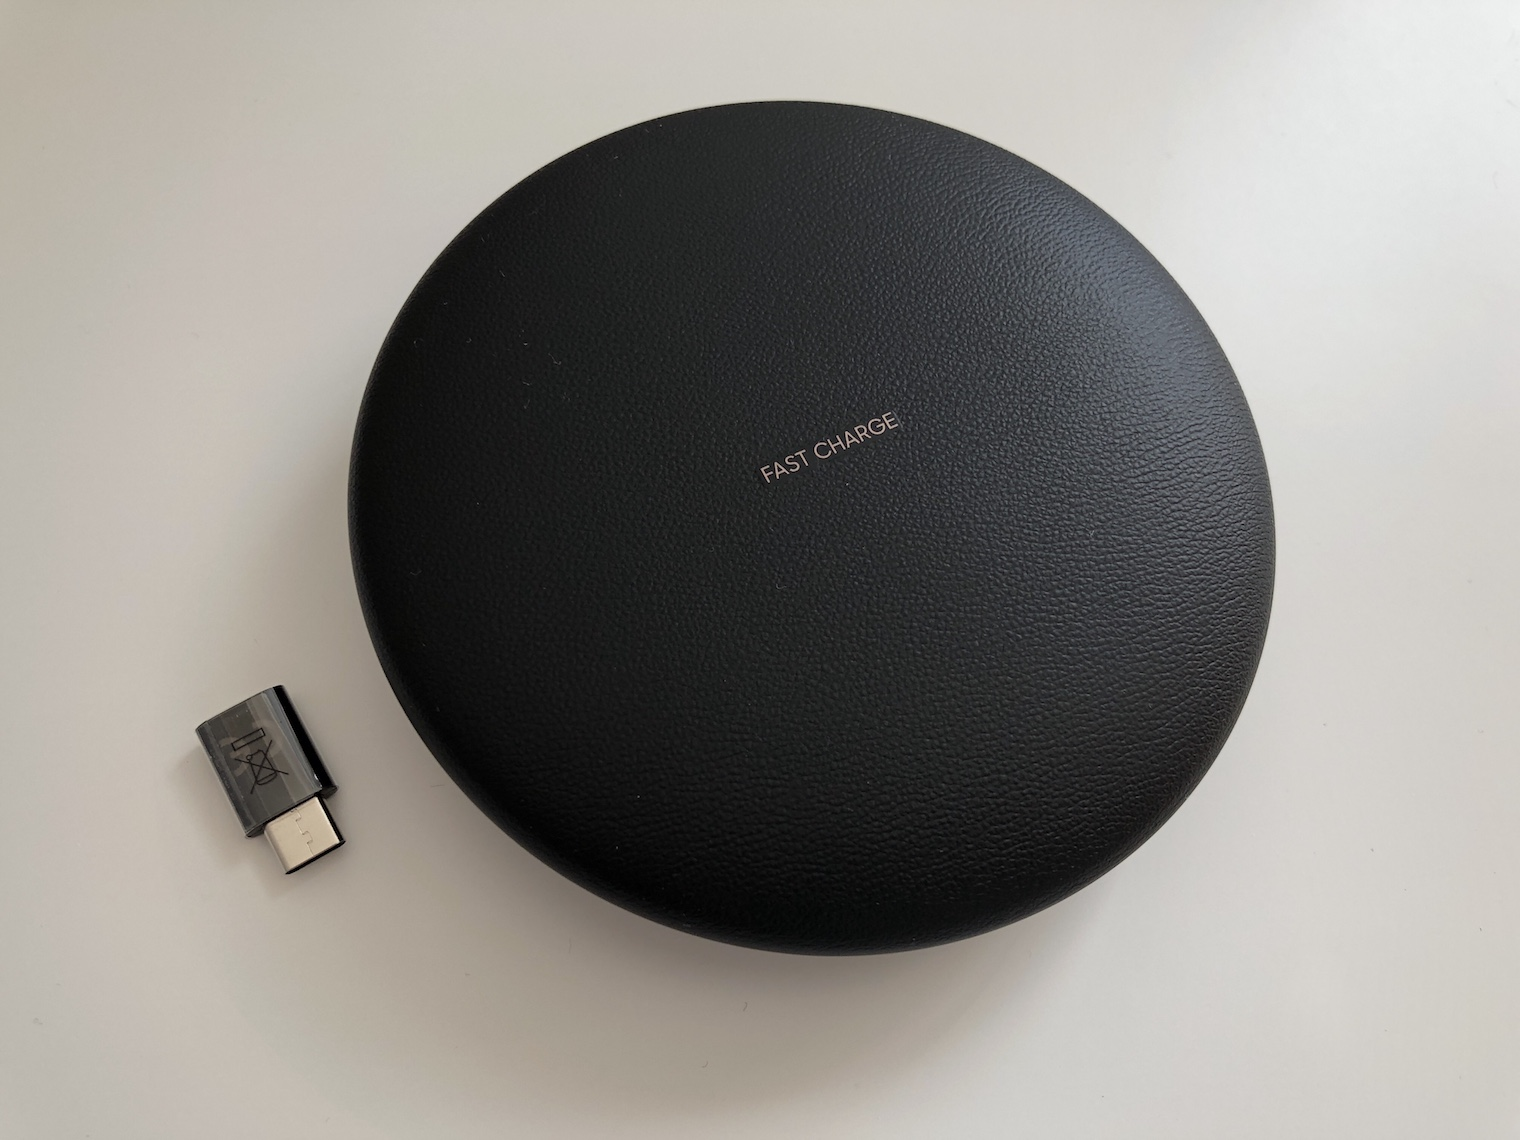 bezdratova podlozka Samsung Wireless Charger 2